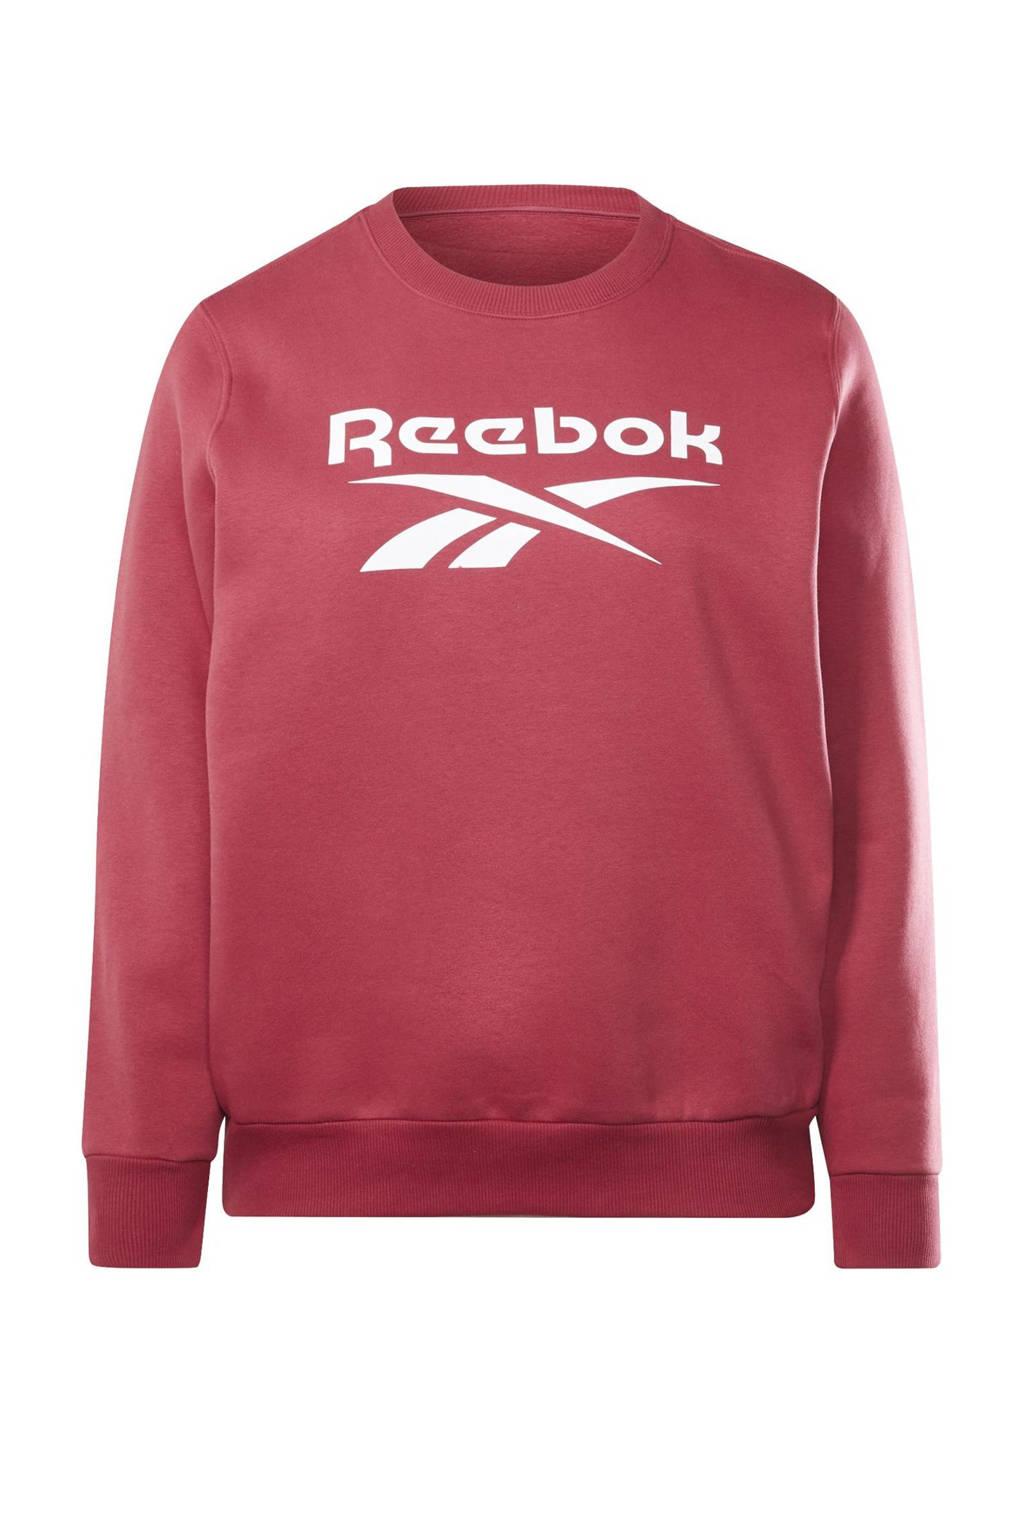 Reebok Classics Plus Size fleece sweater fuchsia, Fuchsia